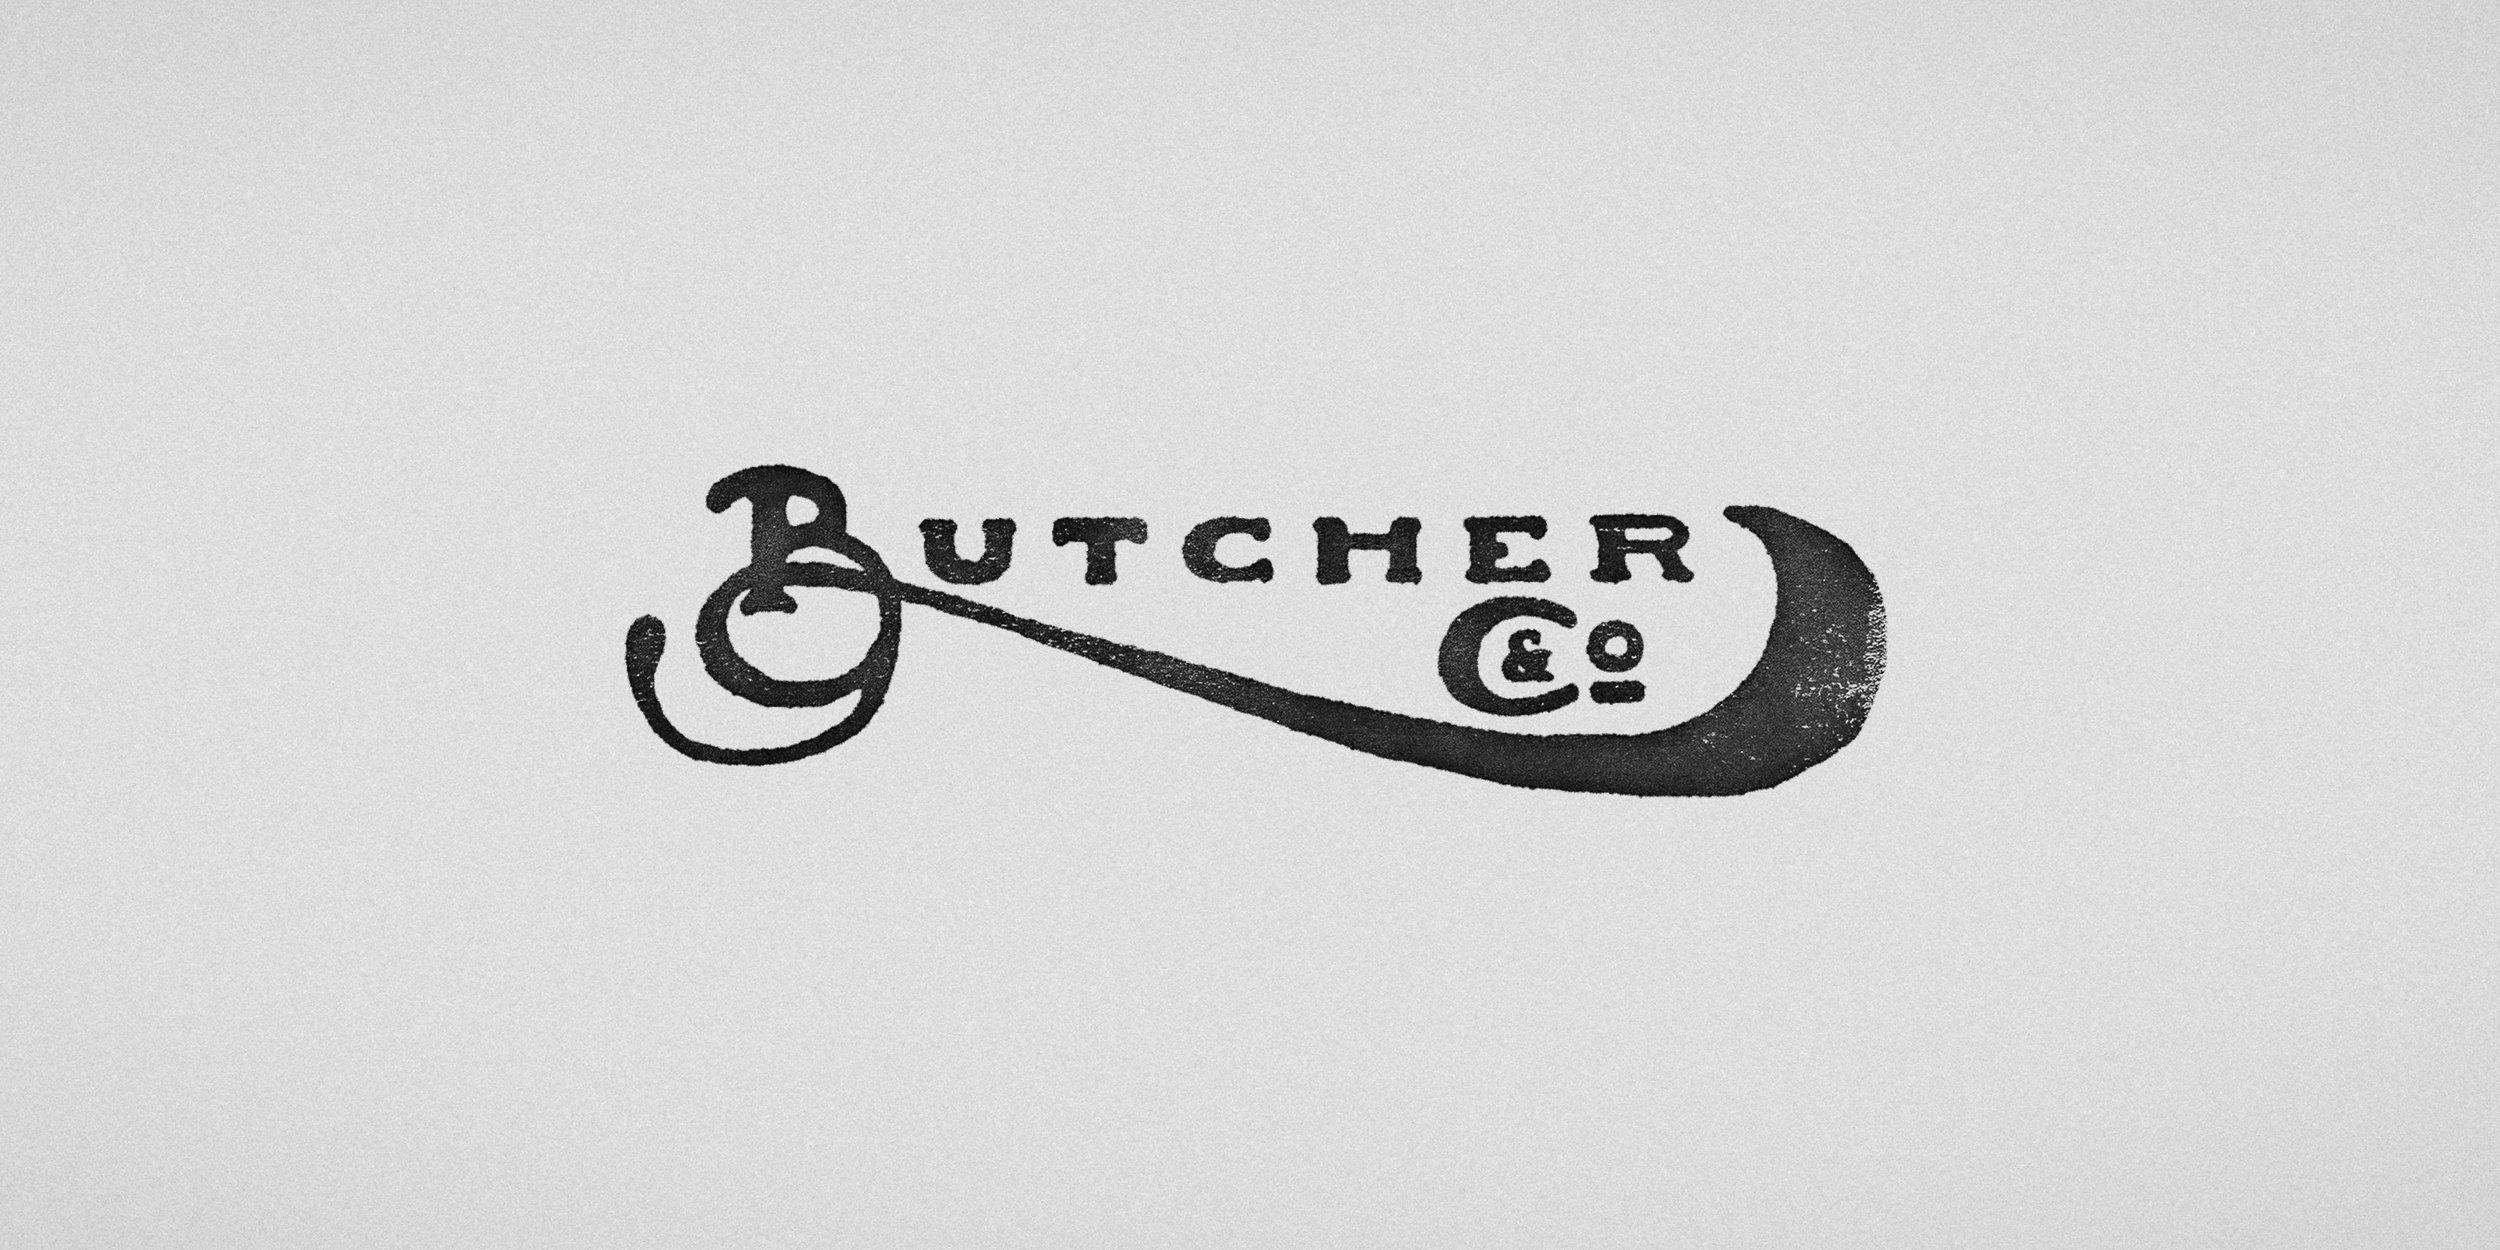 butcher_and_co_detail_med.jpg